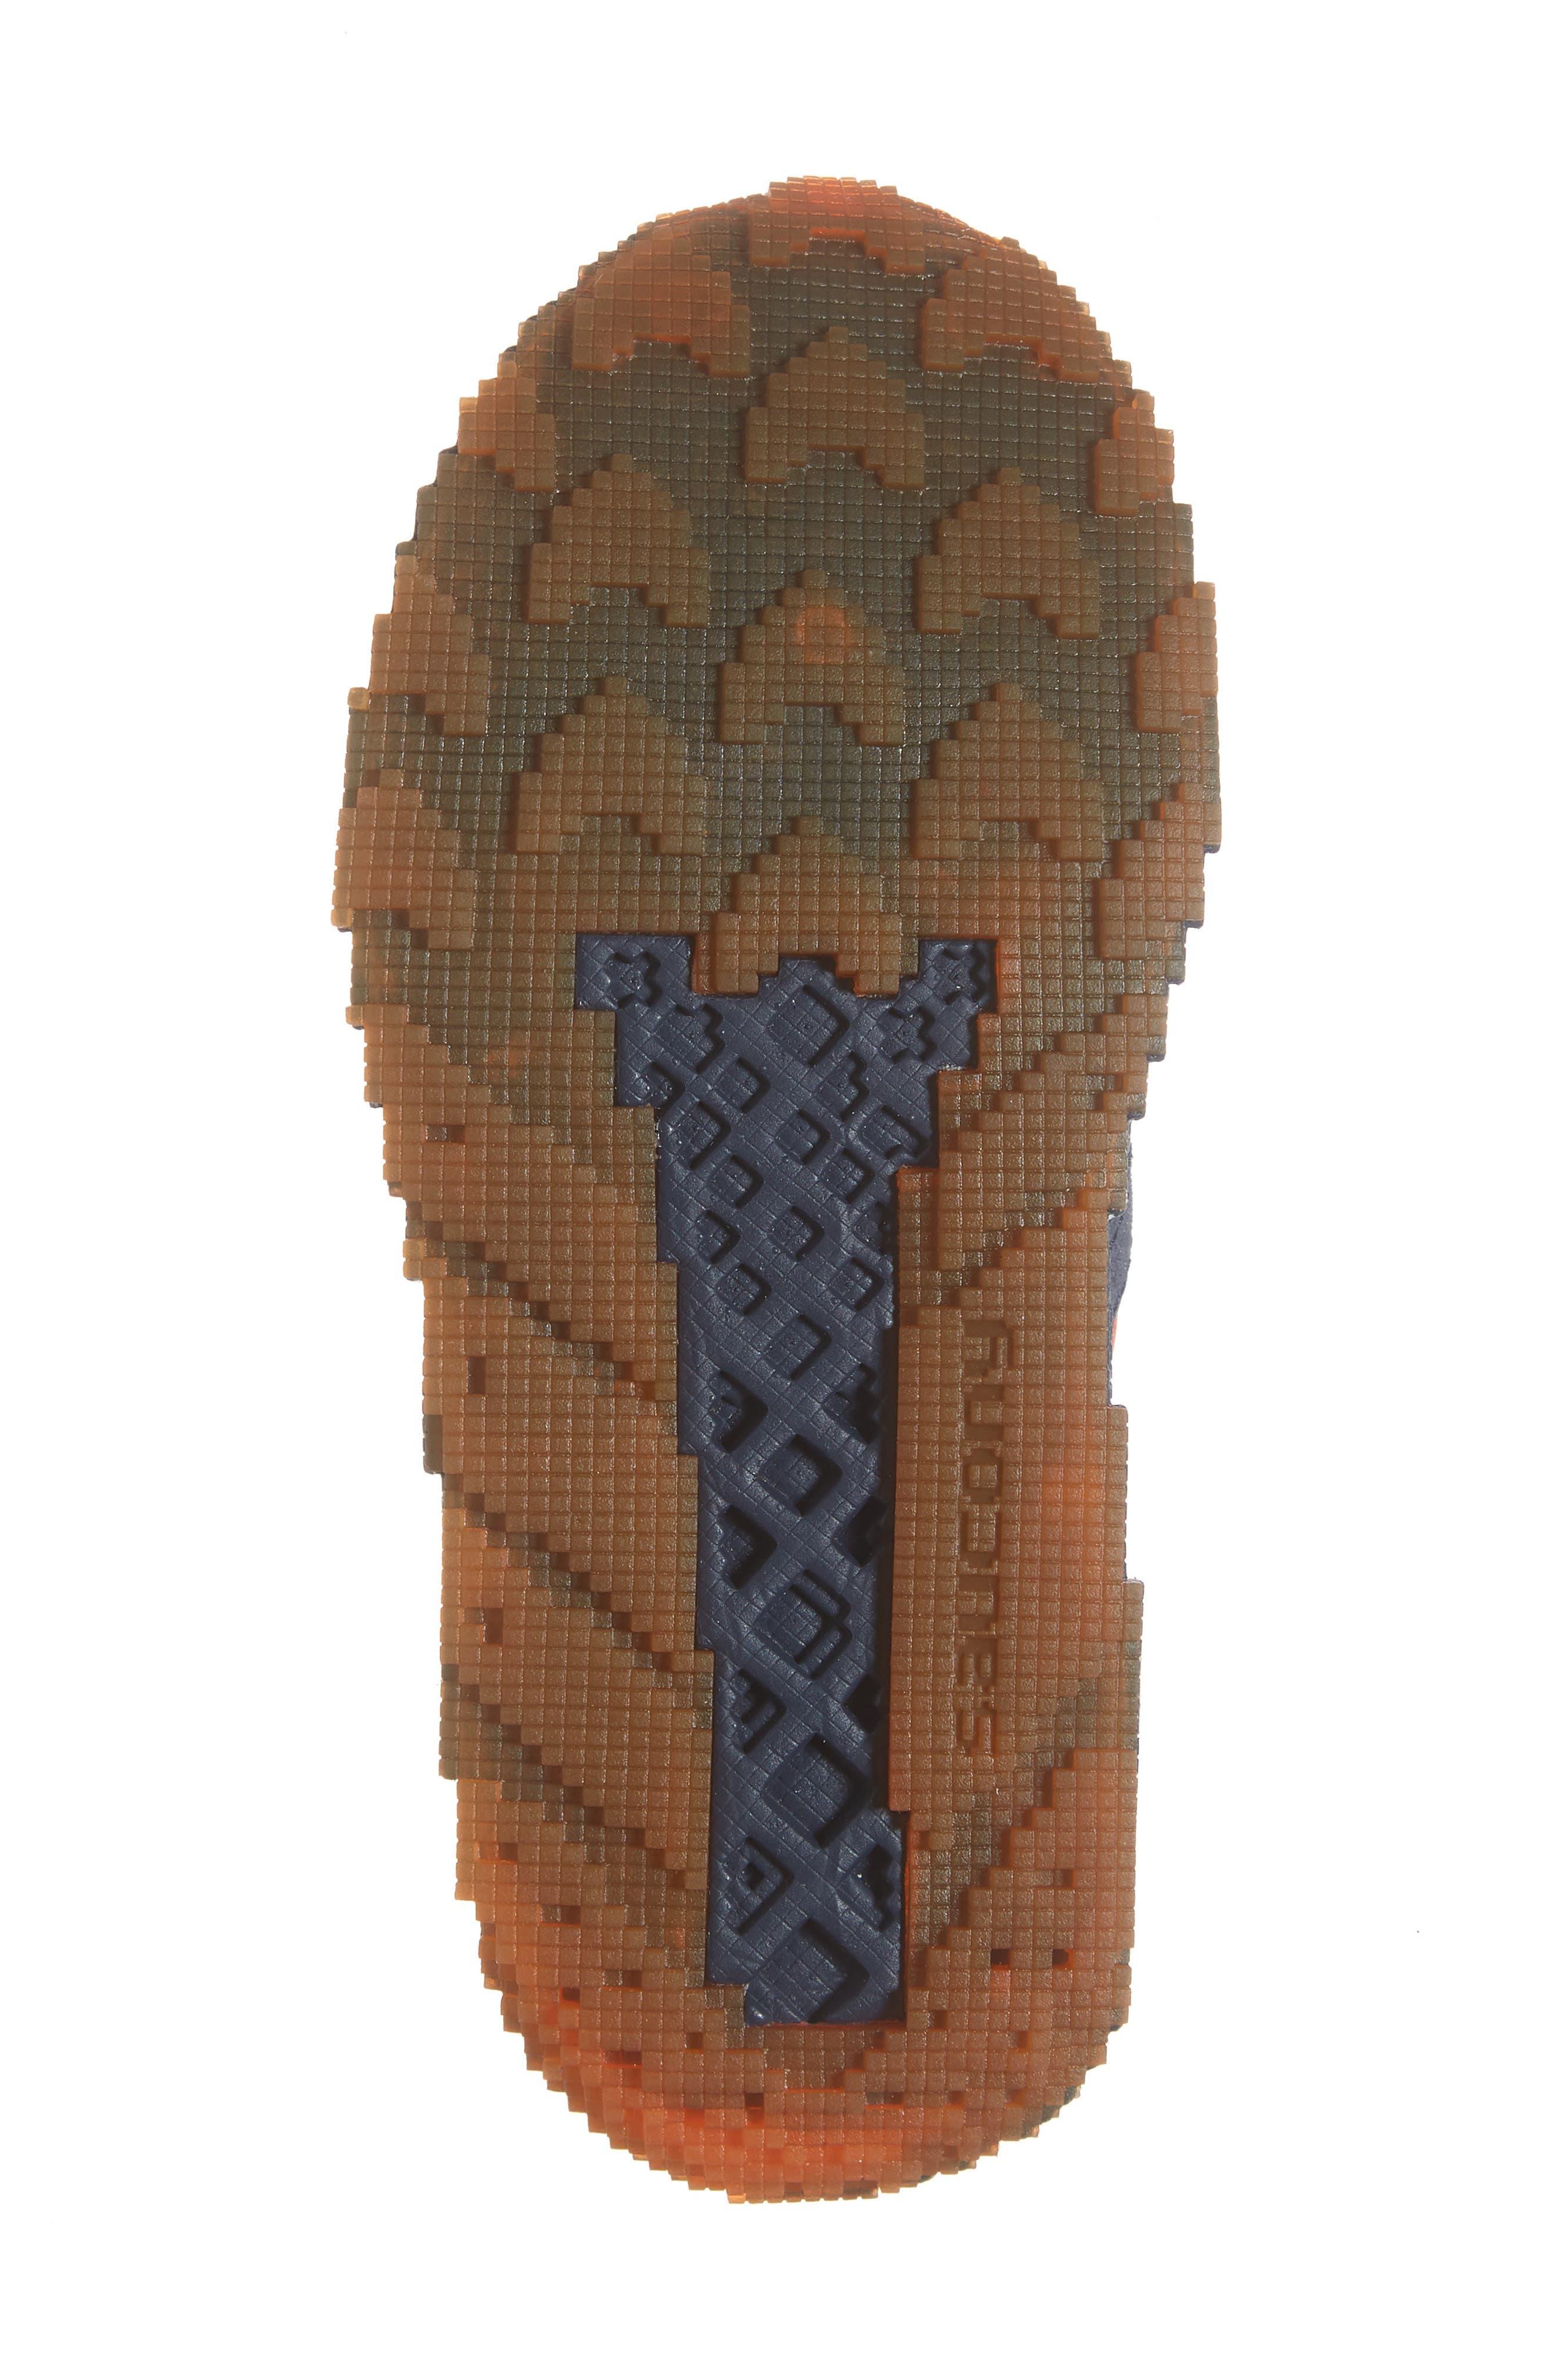 SAUCONY, Voxel 9000 Sneaker, Alternate thumbnail 6, color, BLUE LEATHER/ MESH